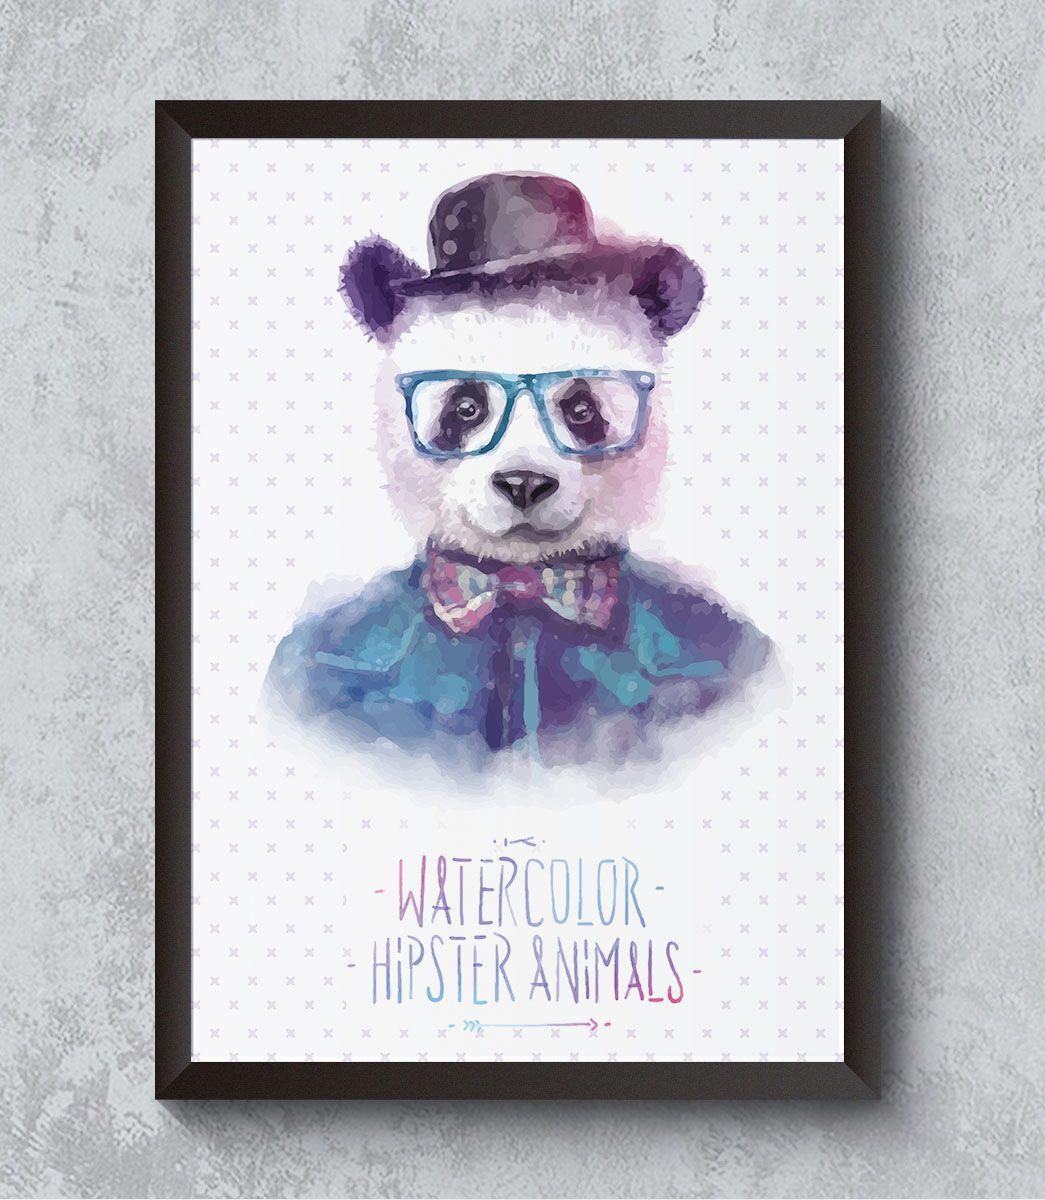 Decorativo - Panda hipster